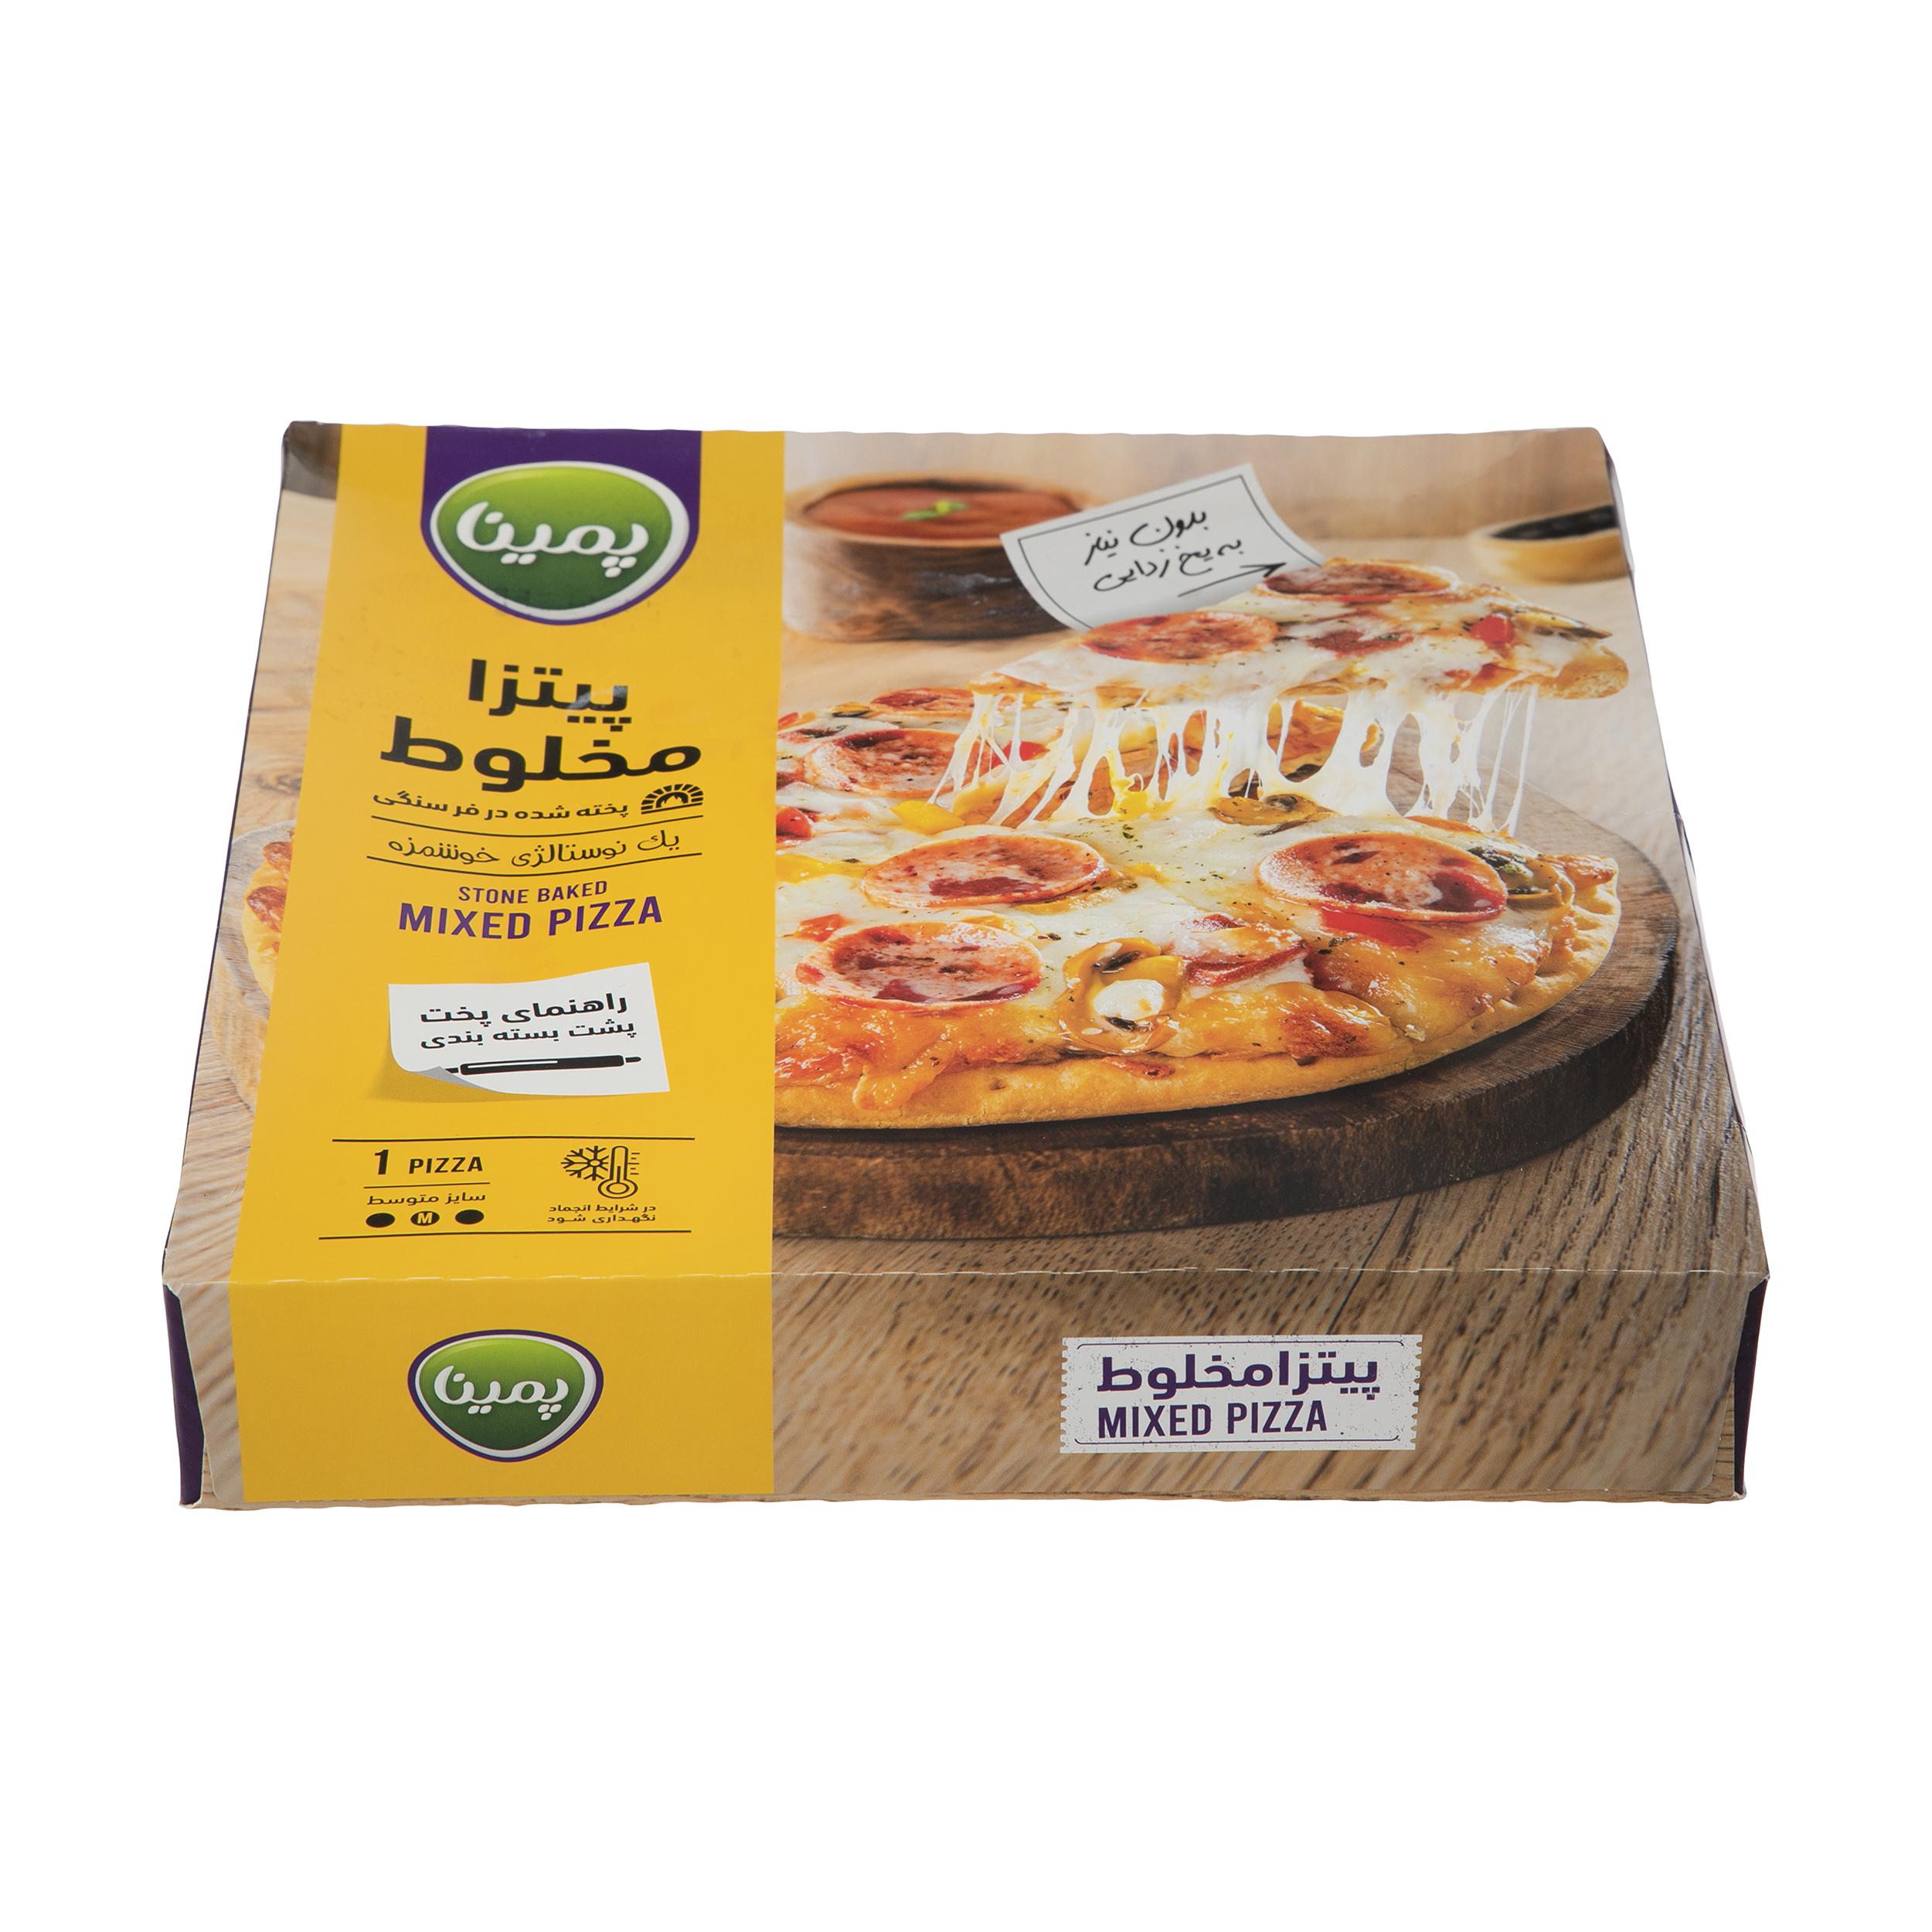 پیتزا مخلوط پمینا کاله مقدار 450 گرم